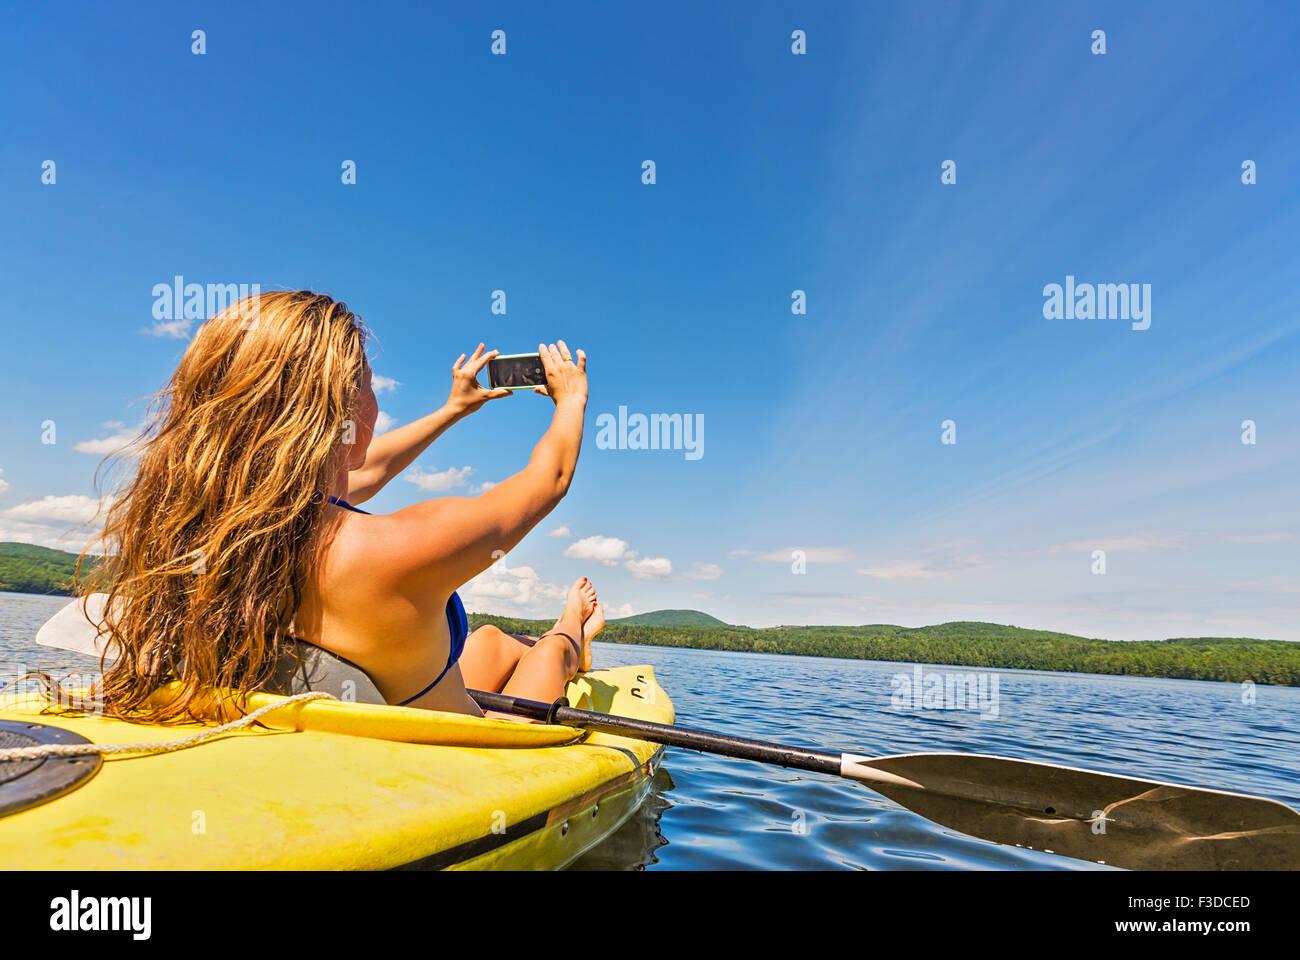 Young woman taking selfie in kayak on lake Stock Photo